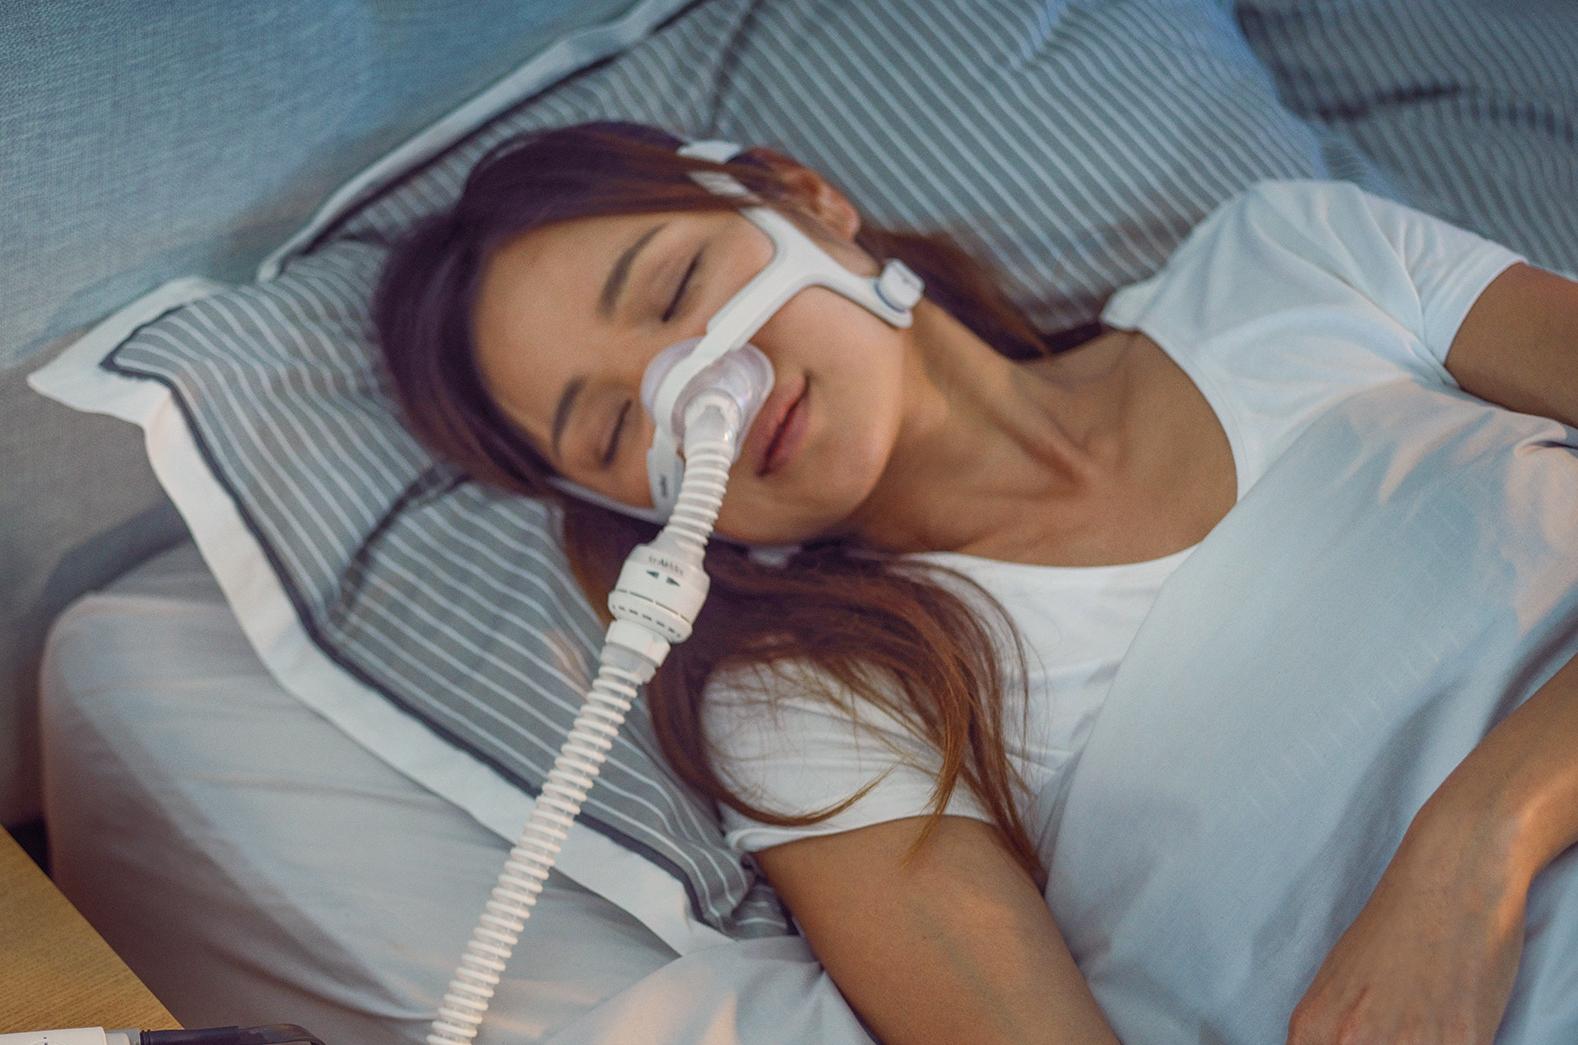 Woman-sleeping-with-AirMini-1MB.jpg